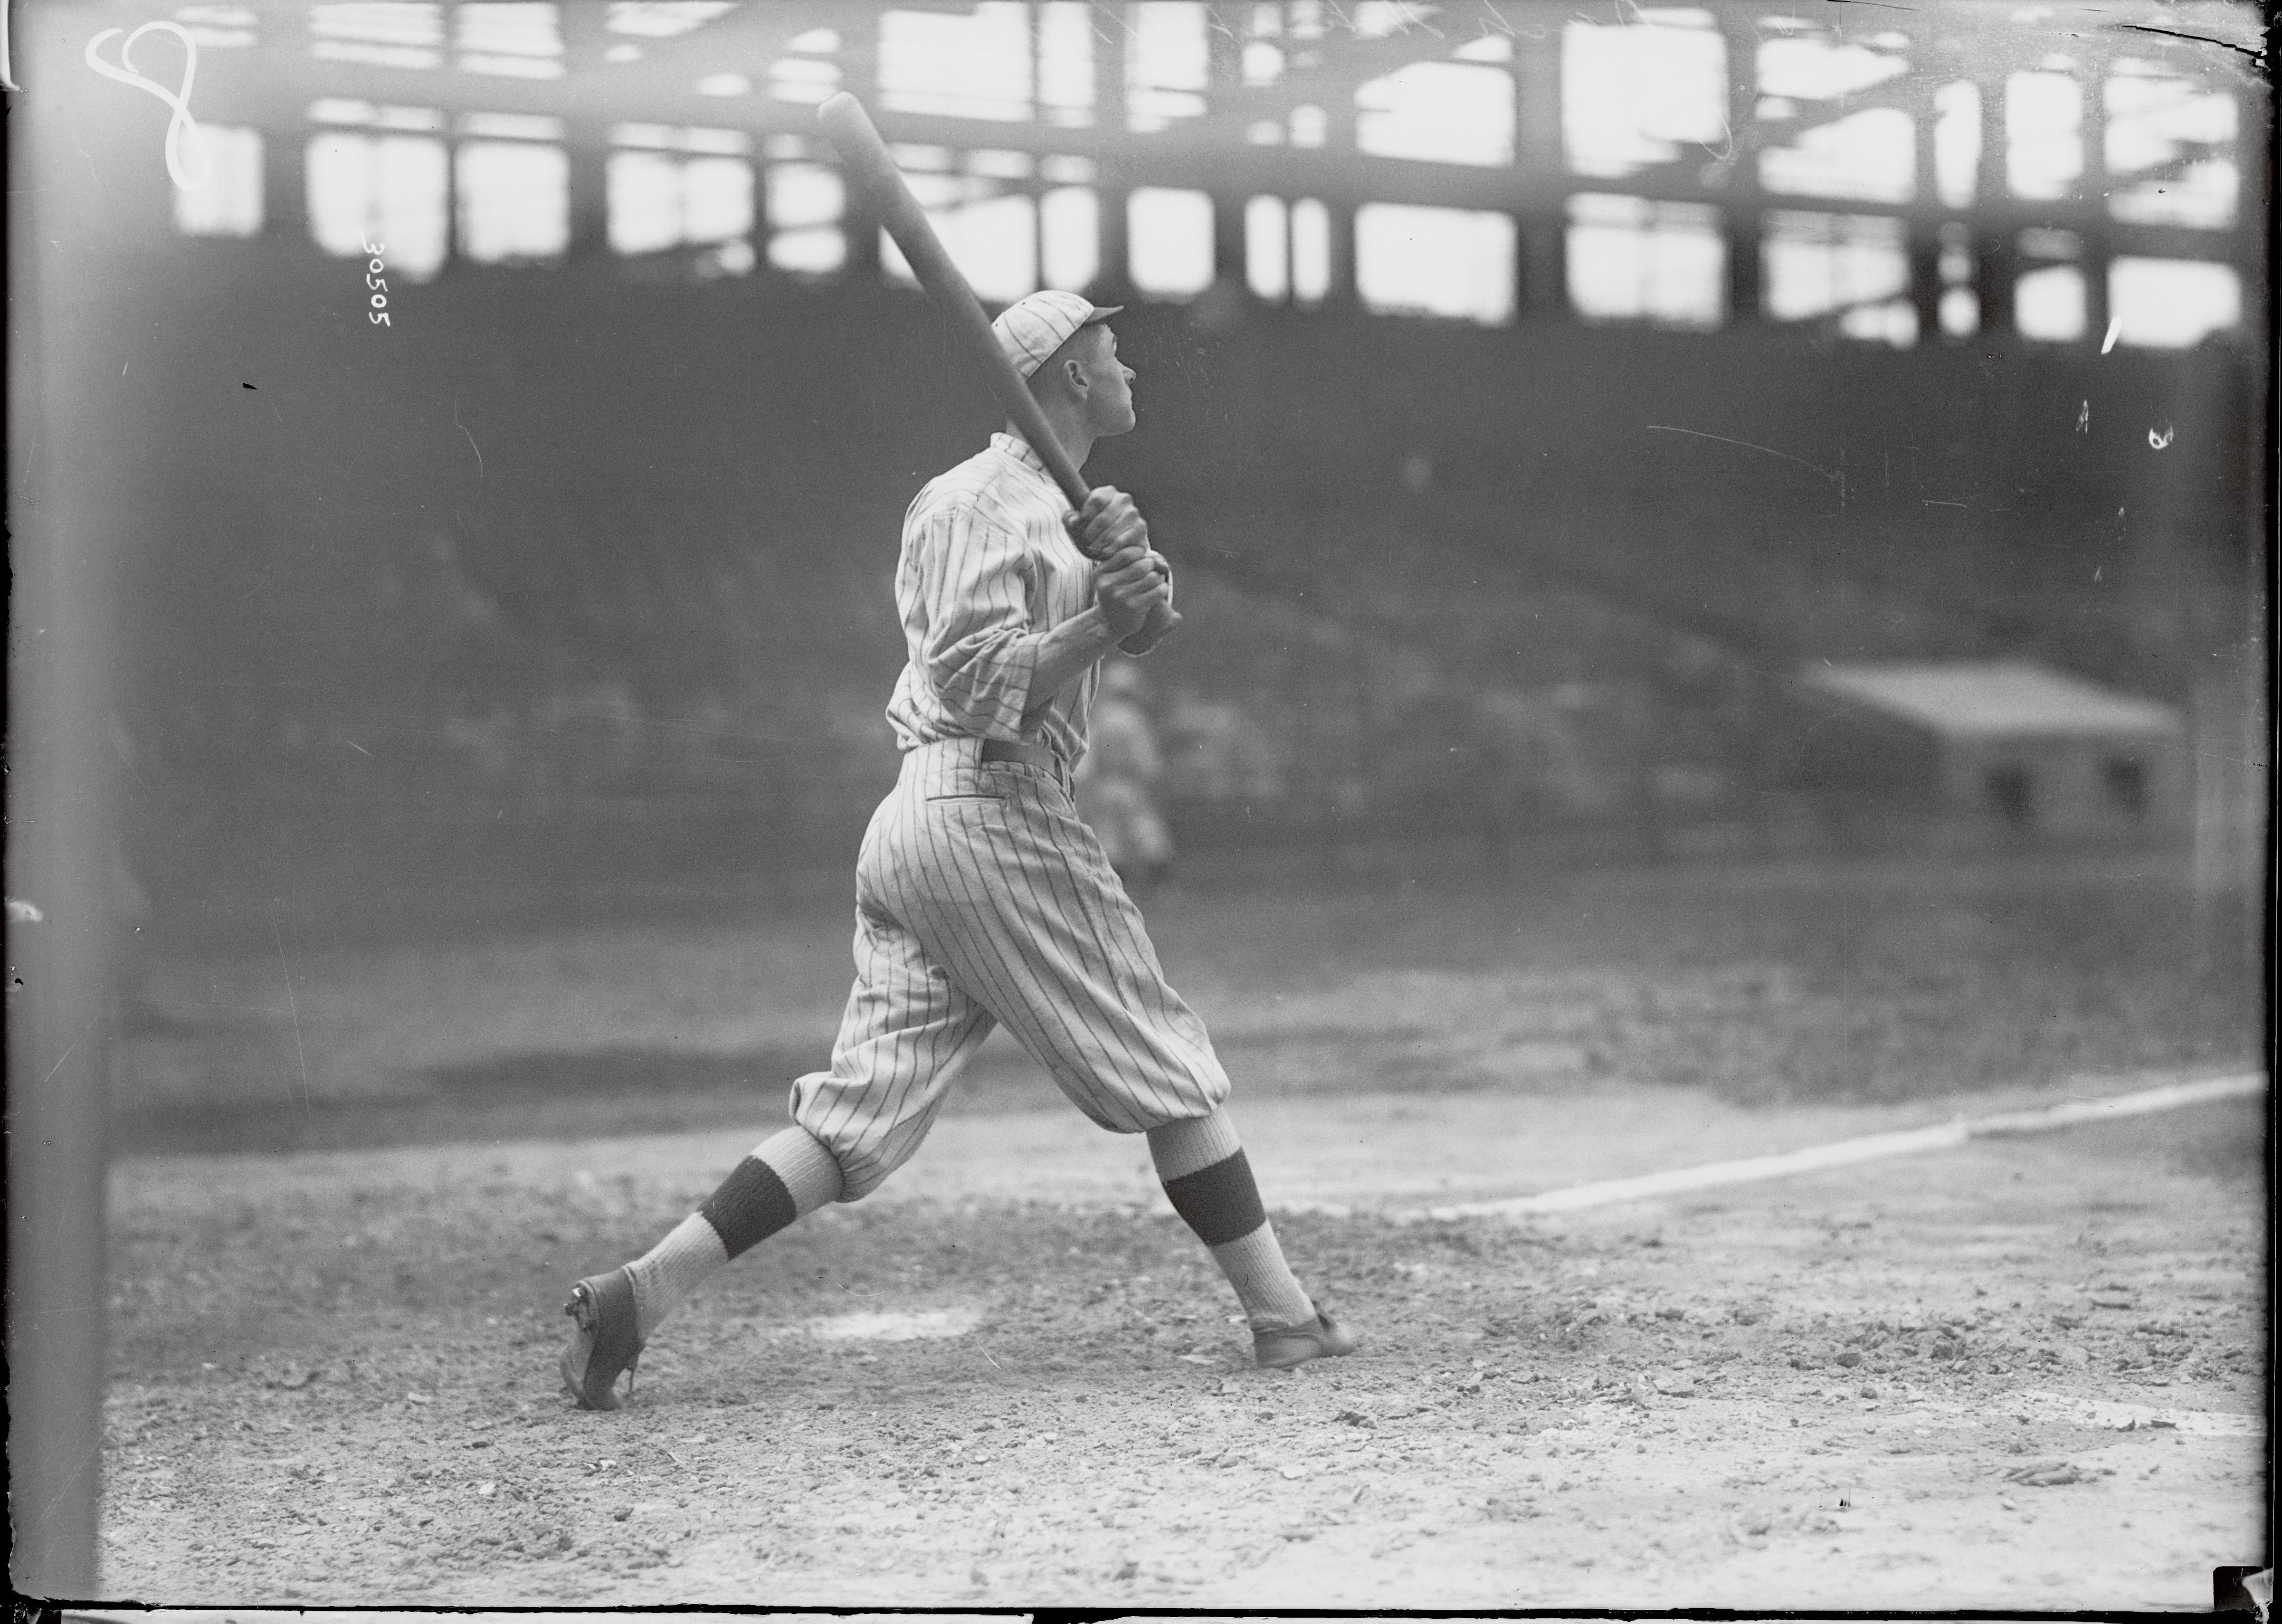 Zach Wheat Swinging Bat